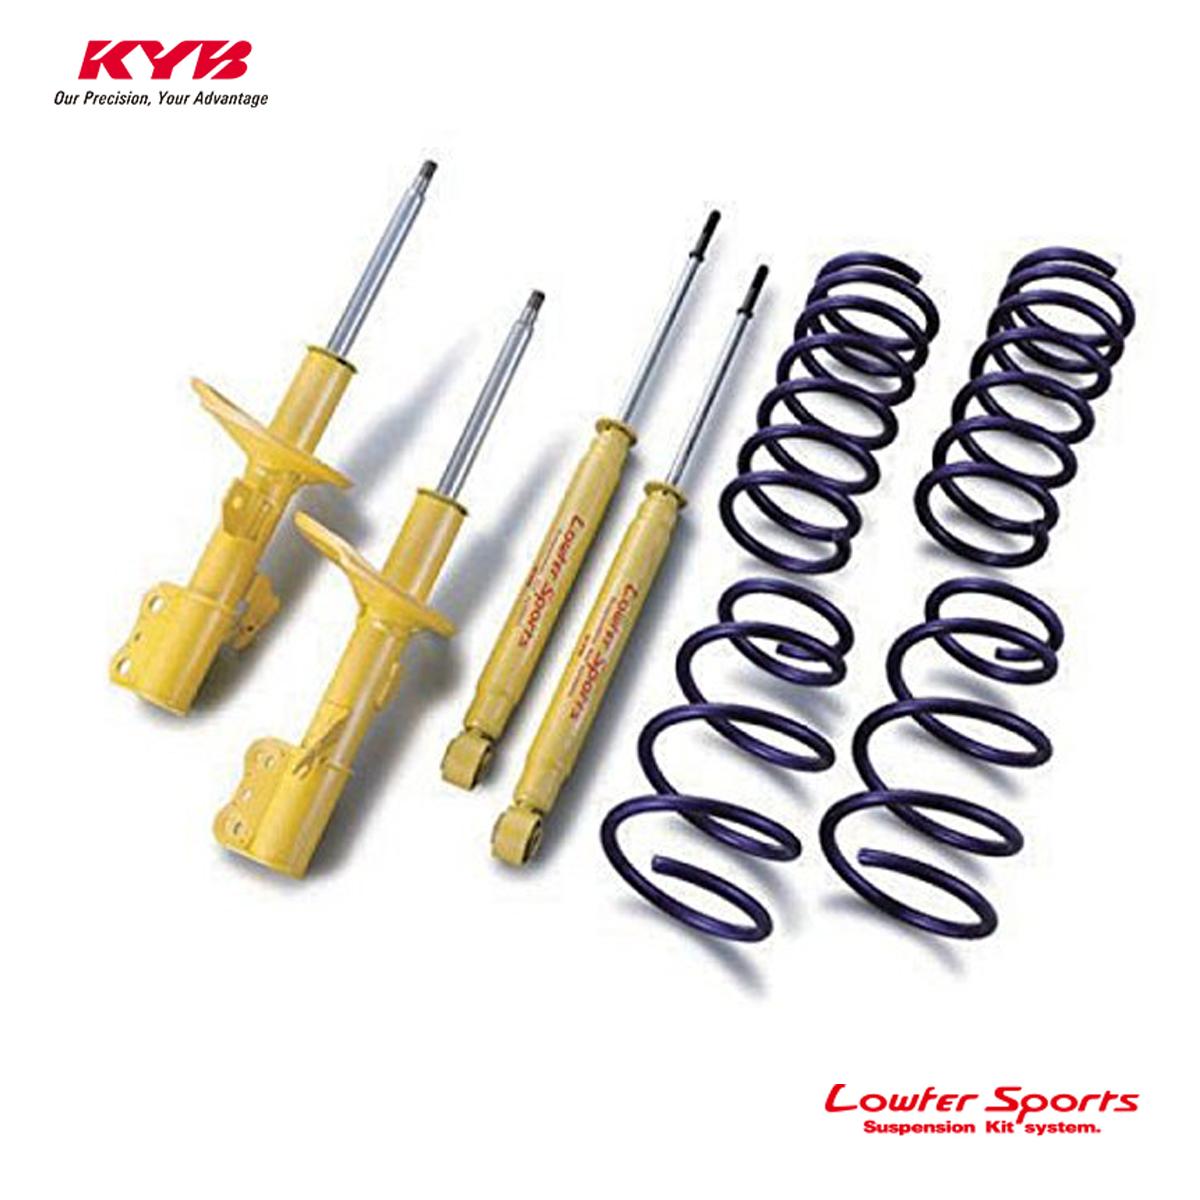 KYB カヤバ エスティマT ACR40W ショックアブソーバー サスペンションキット Lowfer Sports LKIT-ACR40W 配送先条件有り